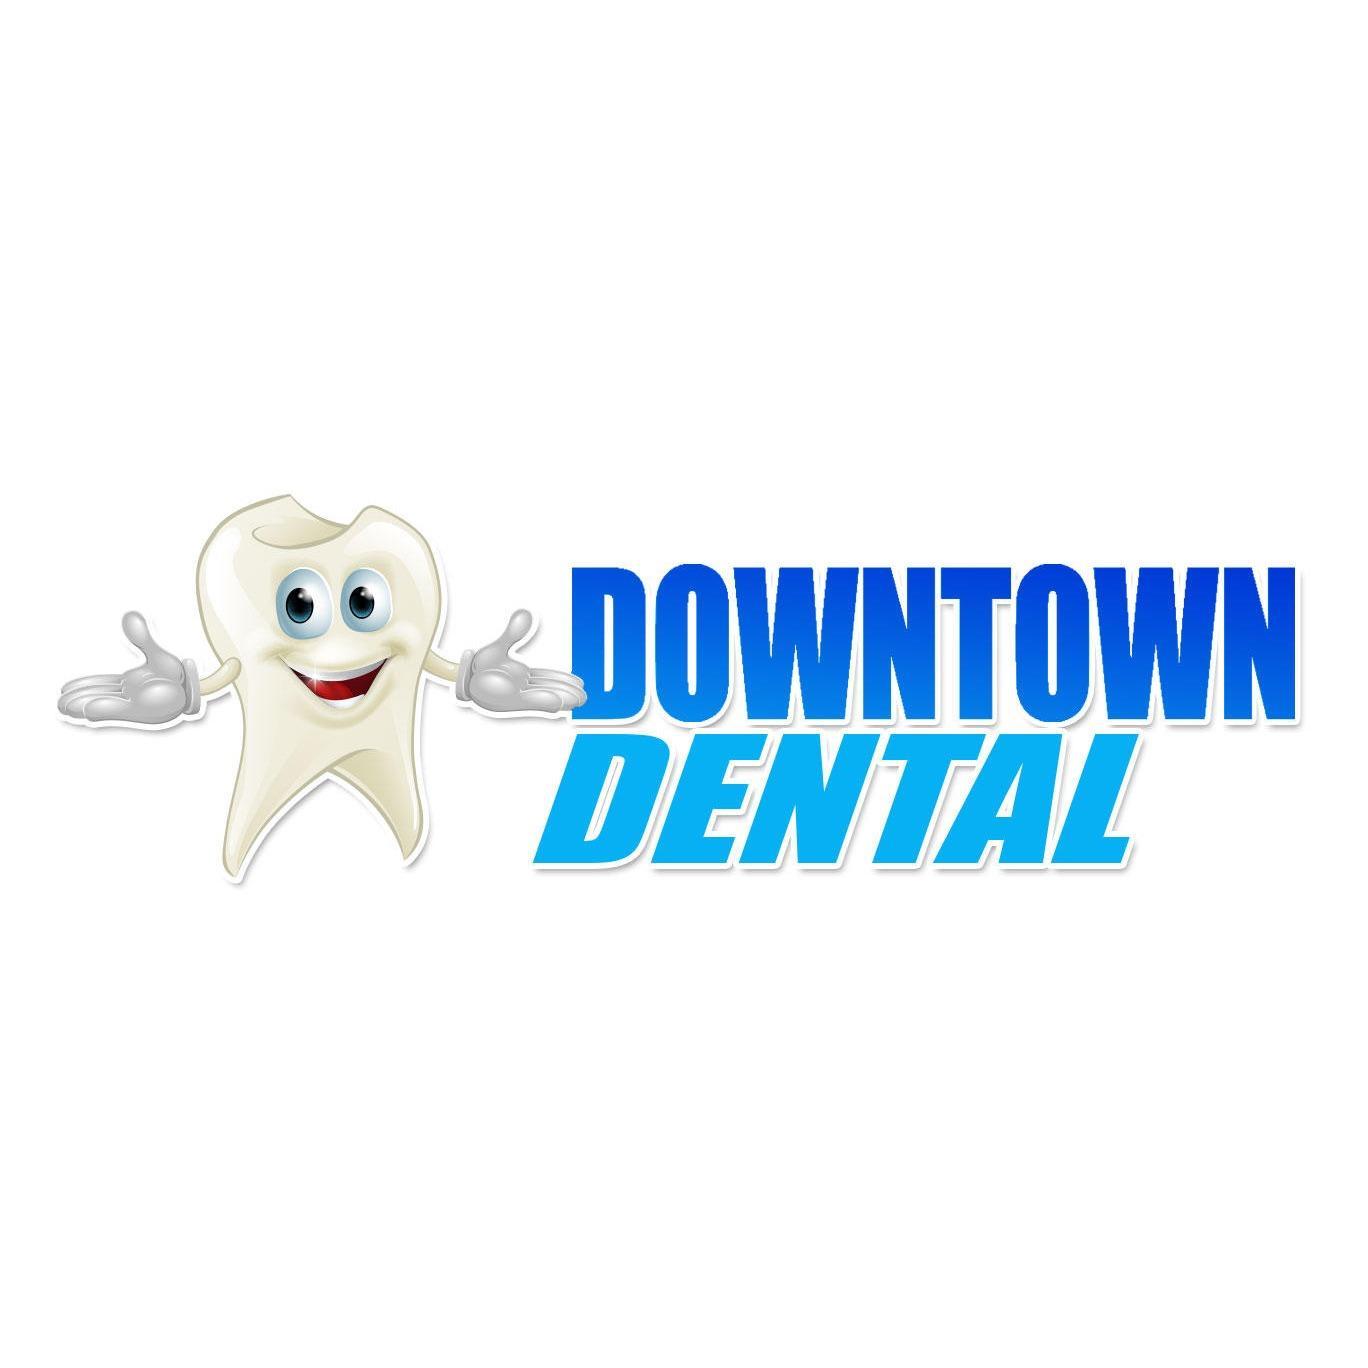 Downtown Dental CT - Bridgeport - Bridgeport, CT 06604 - (203)367-0400 | ShowMeLocal.com